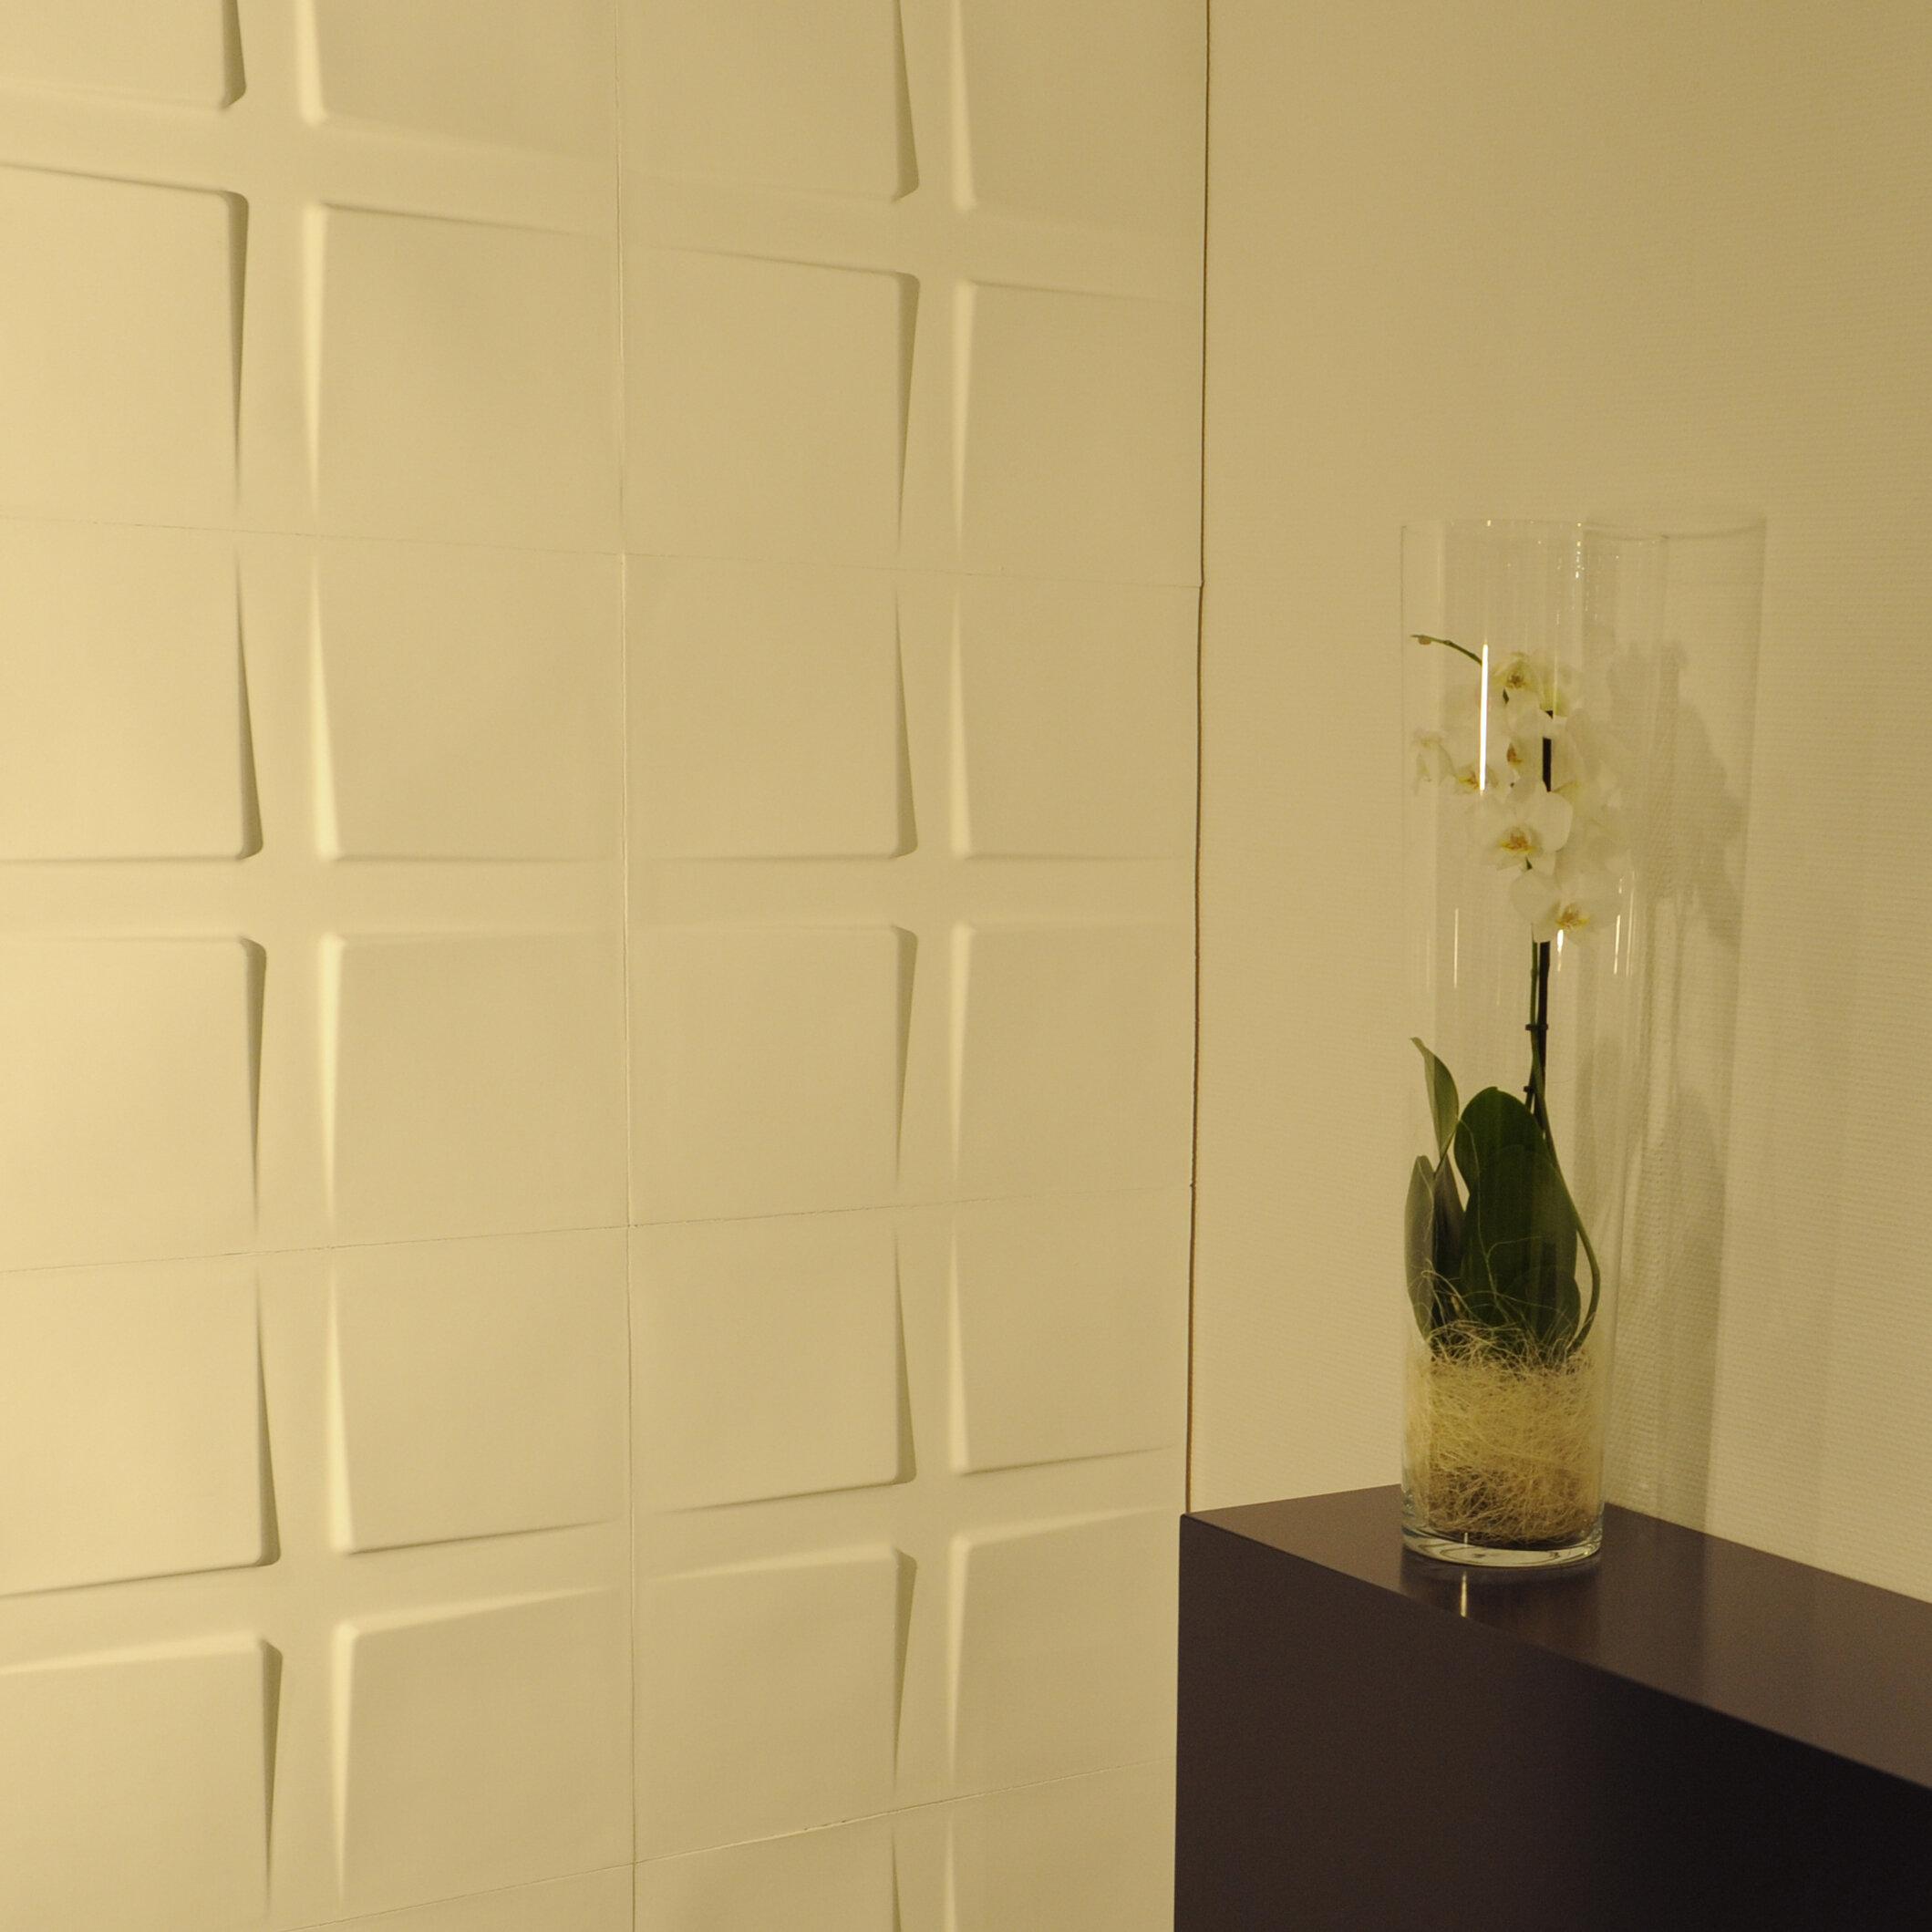 Decor Wonderland Pitches 3D Decorative Wall Panels | Wayfair